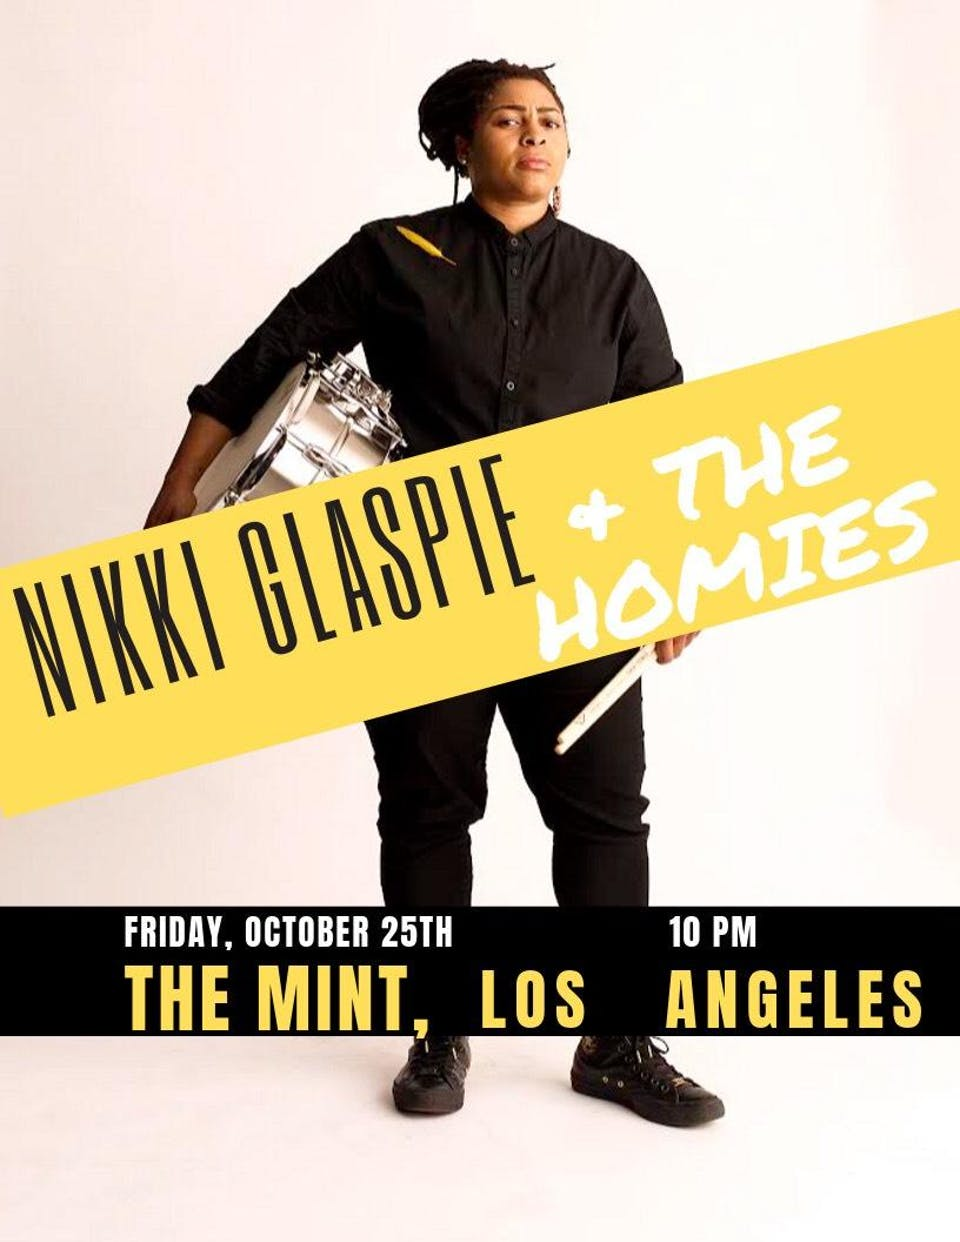 Nikki Glaspie & The Homies, Jammin Jellies, Mission to Midnight